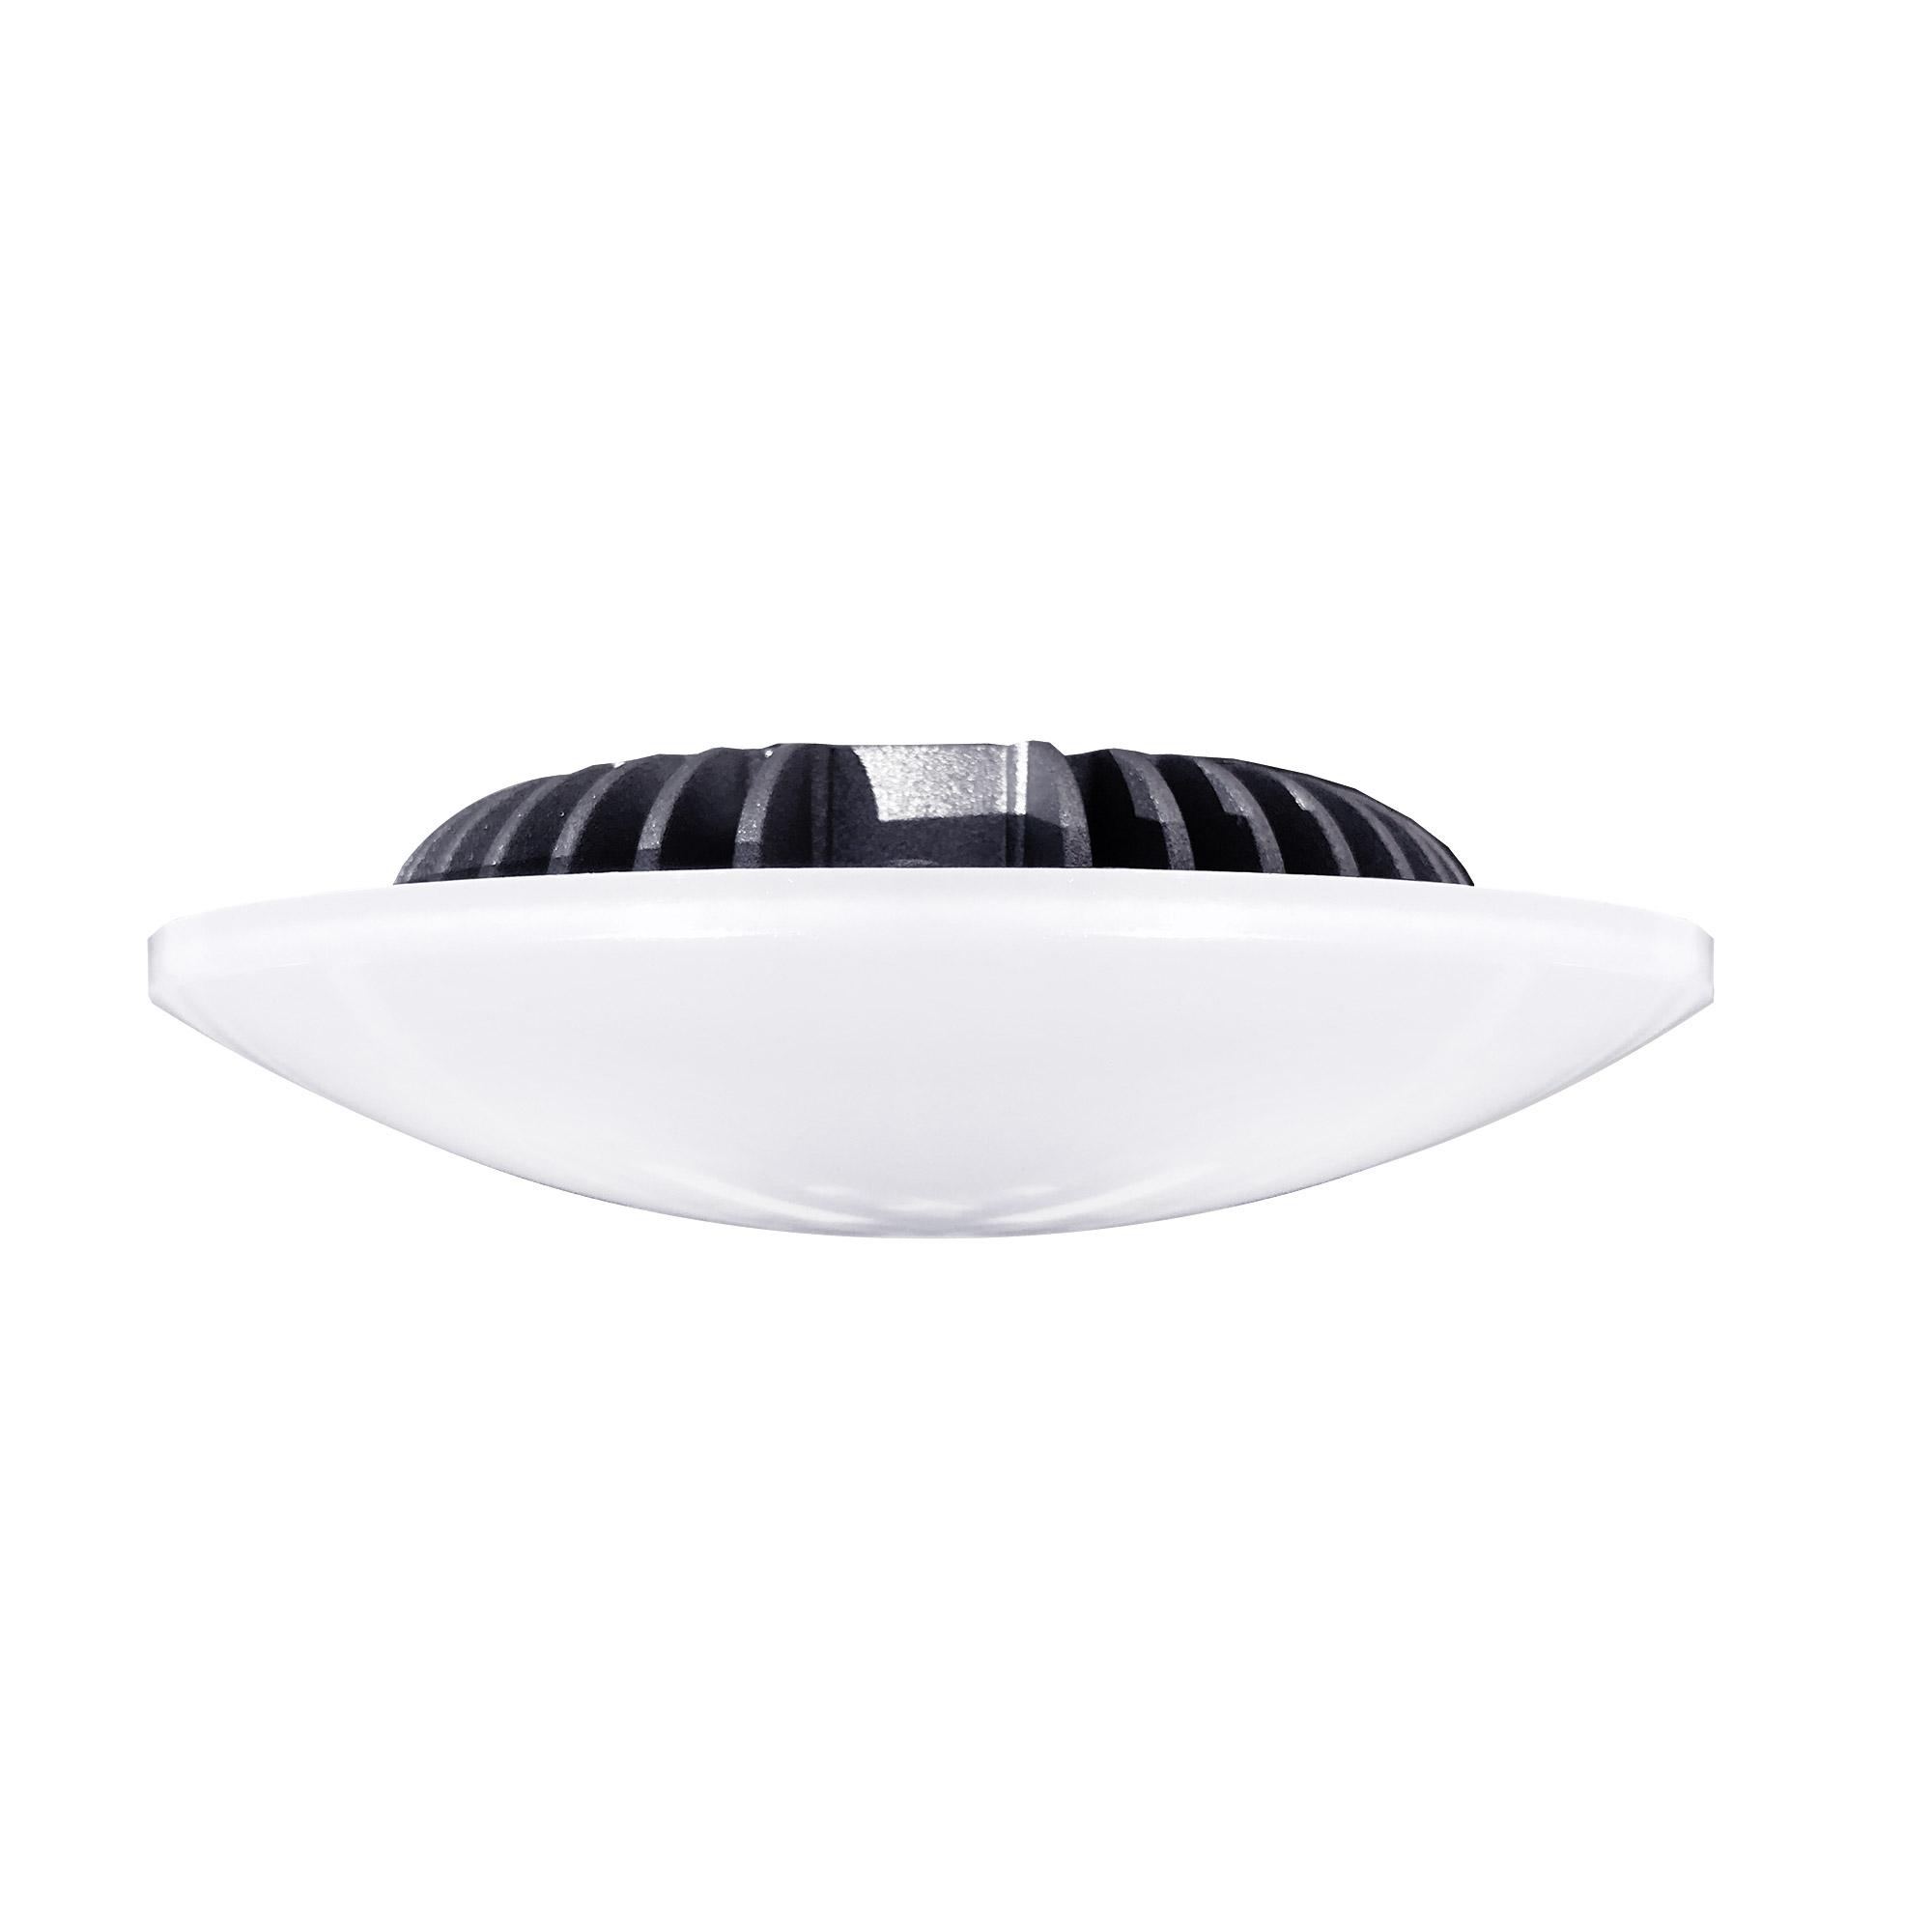 17W LED Light Kit for Spitfire Ceiling Fans